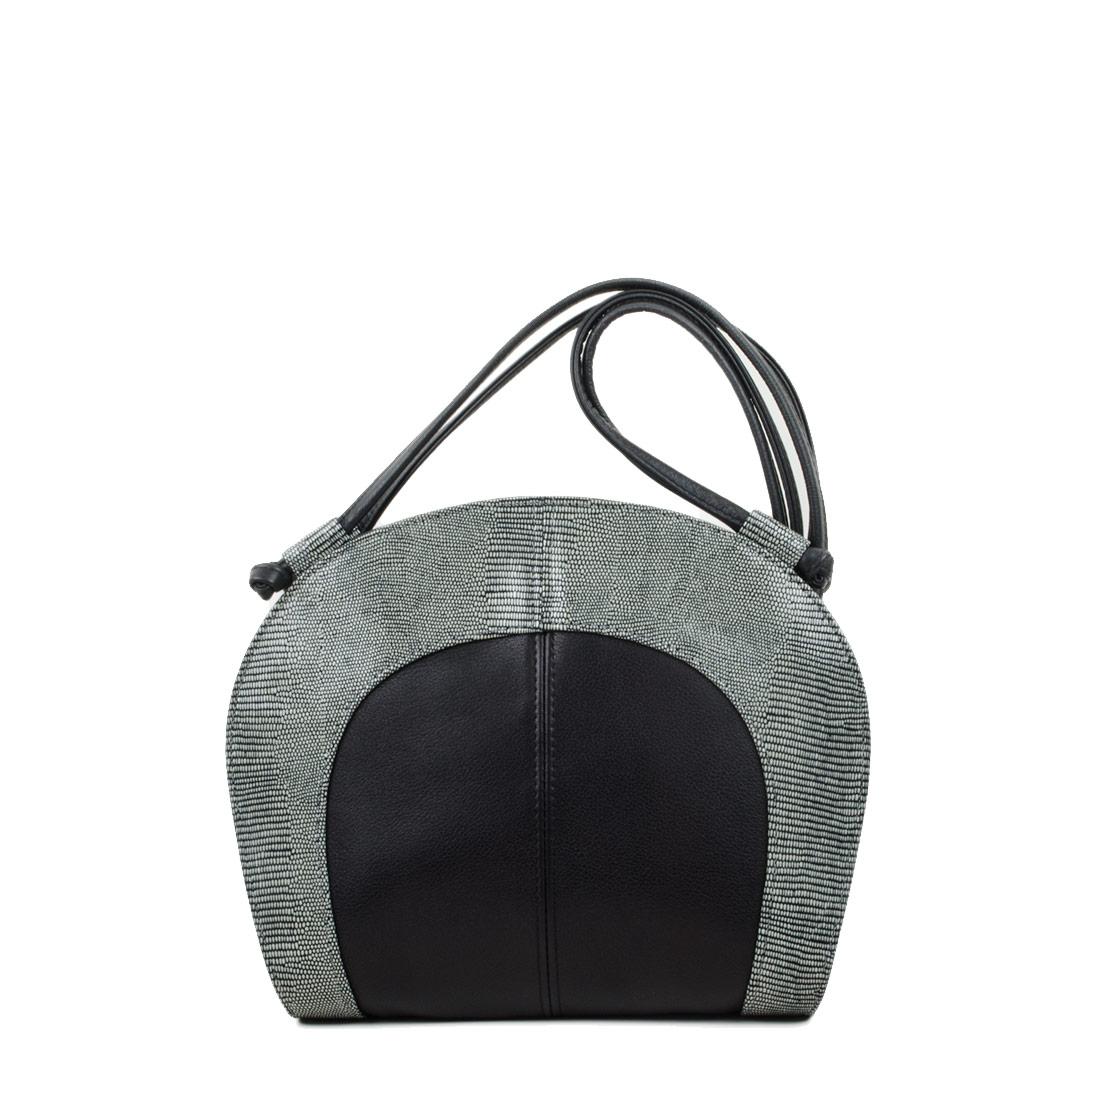 Molly Courmayeur Print Leather Shoulder Bag